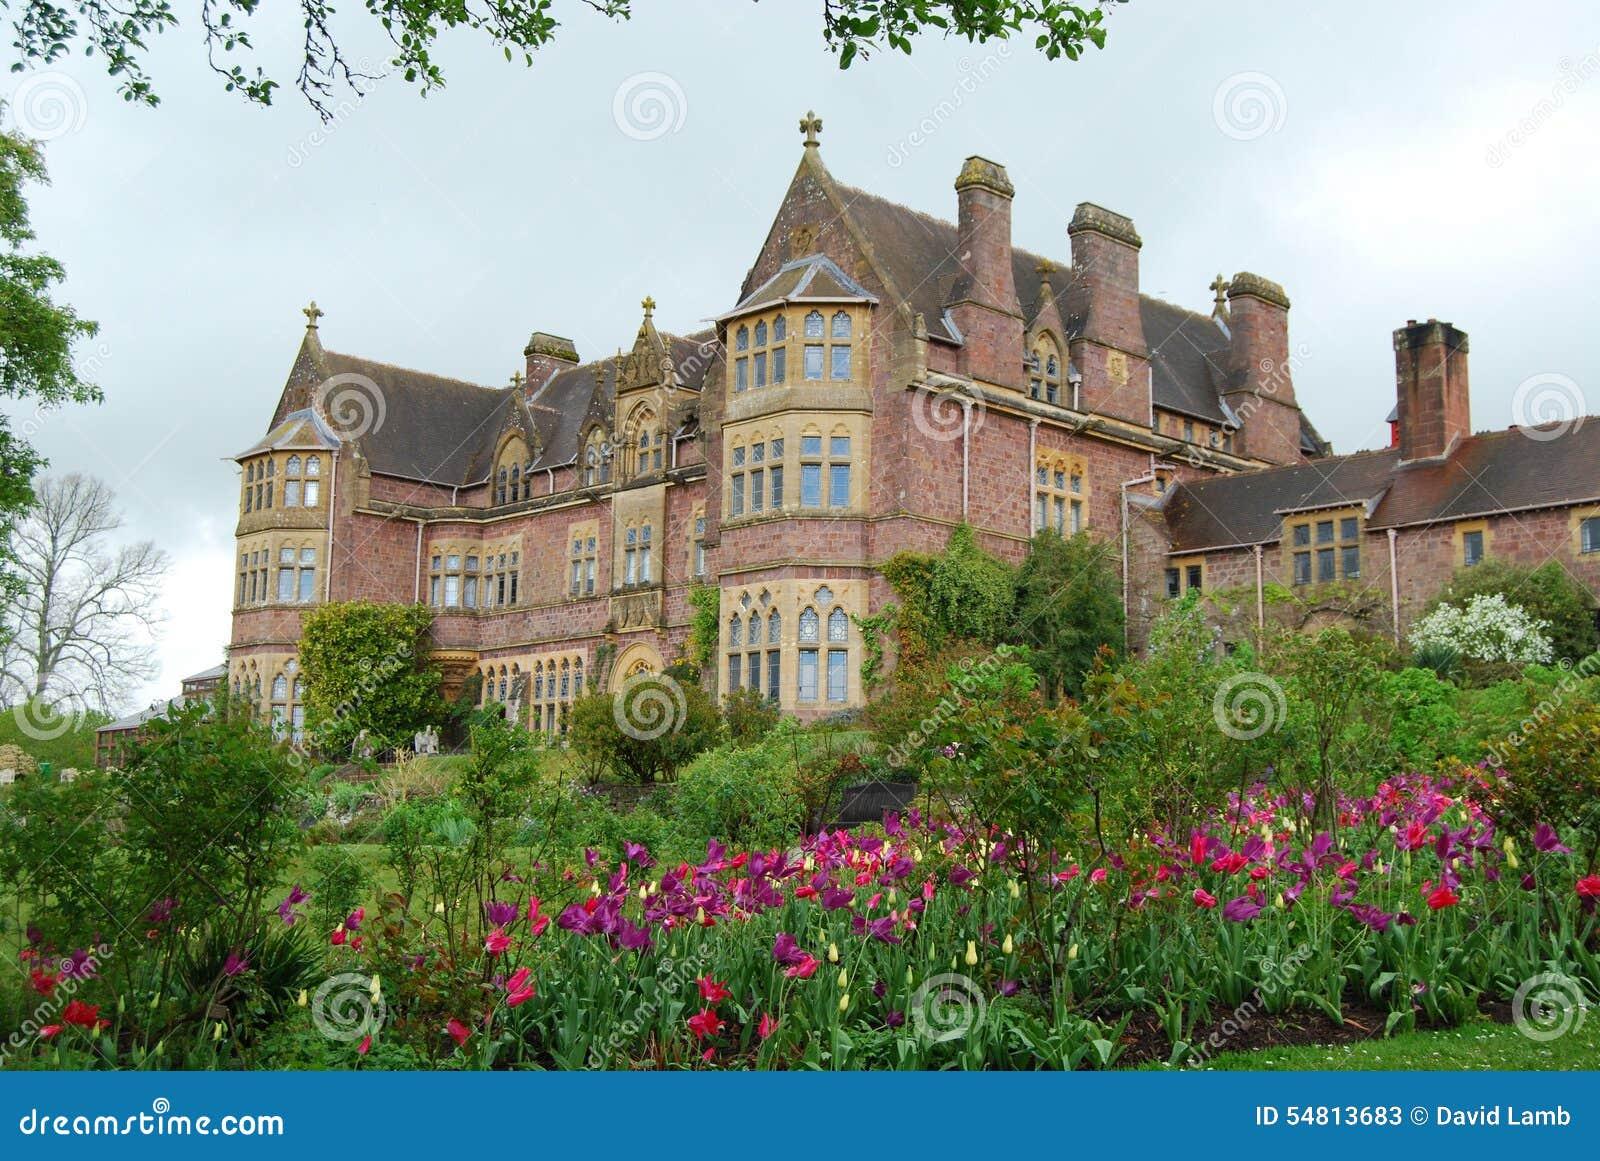 English Country House Devon Stock Photo Image 54813683